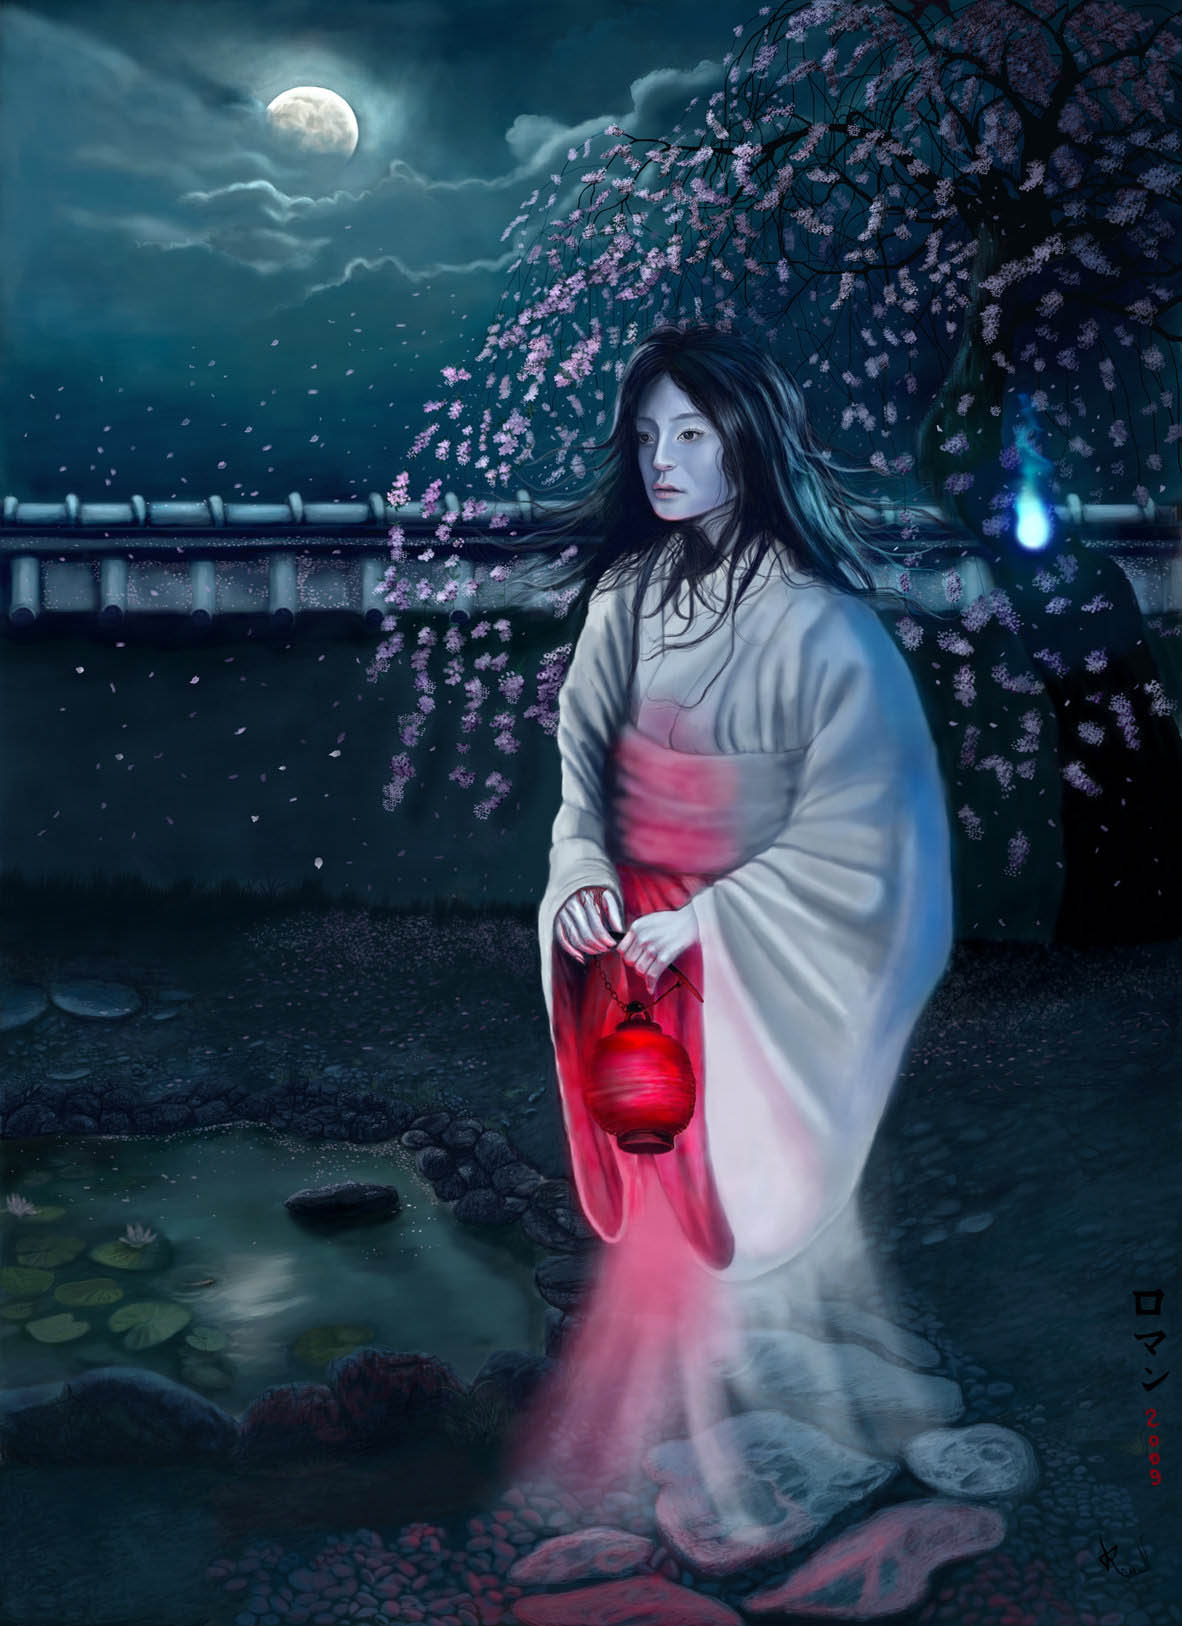 yurei, hantu tradisional masyarakat jepang